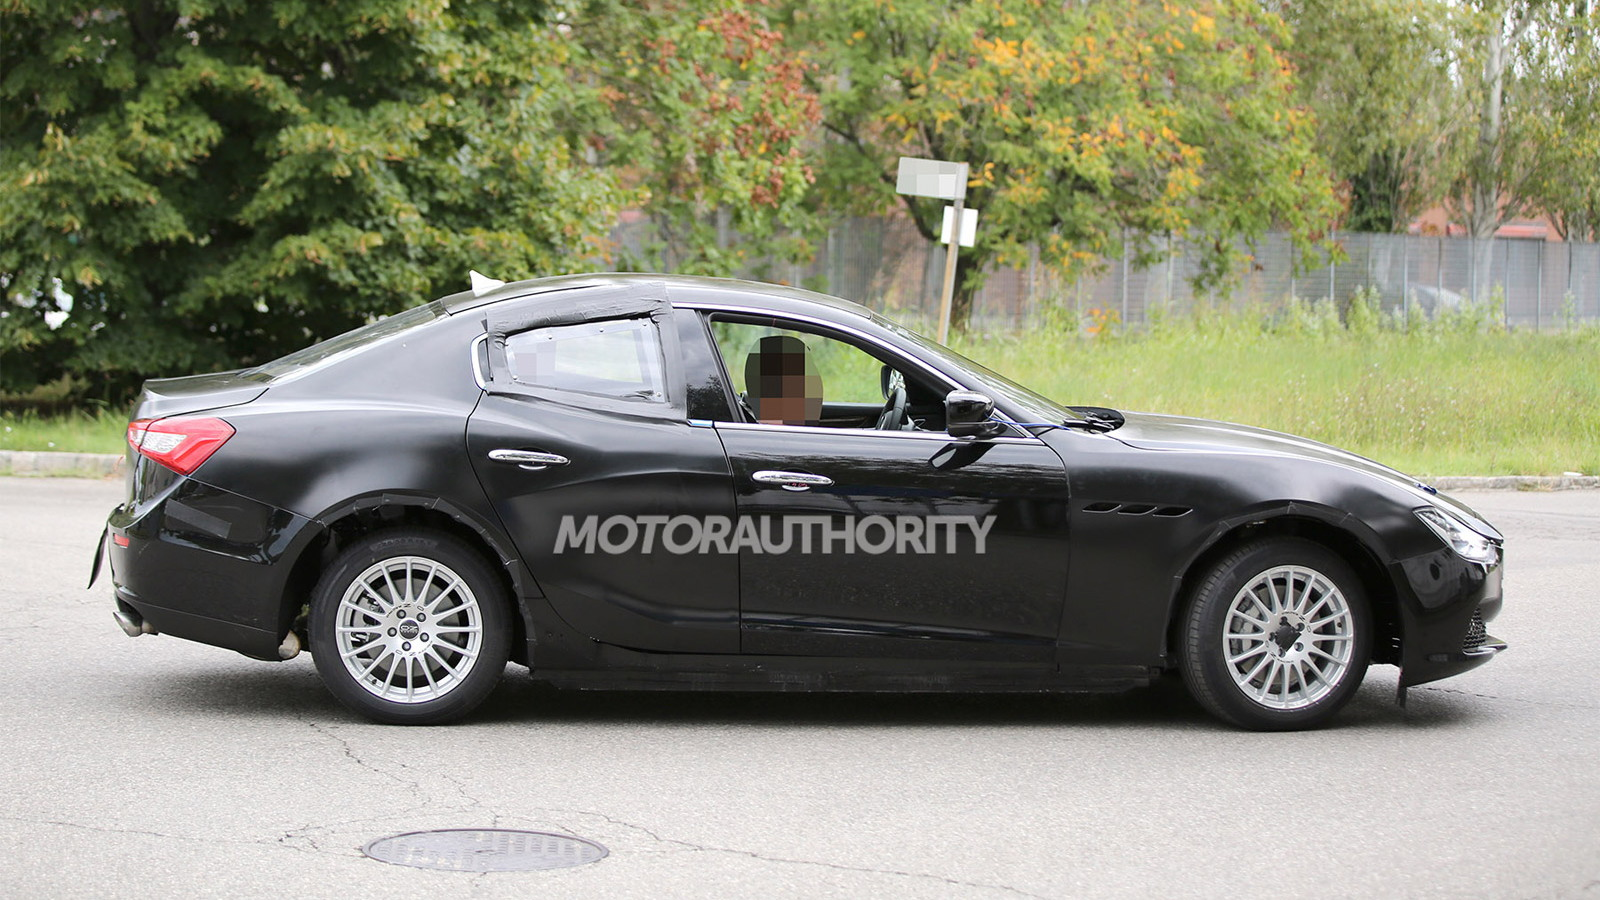 2016 Alfa Romeo Giulia test mule spy shots